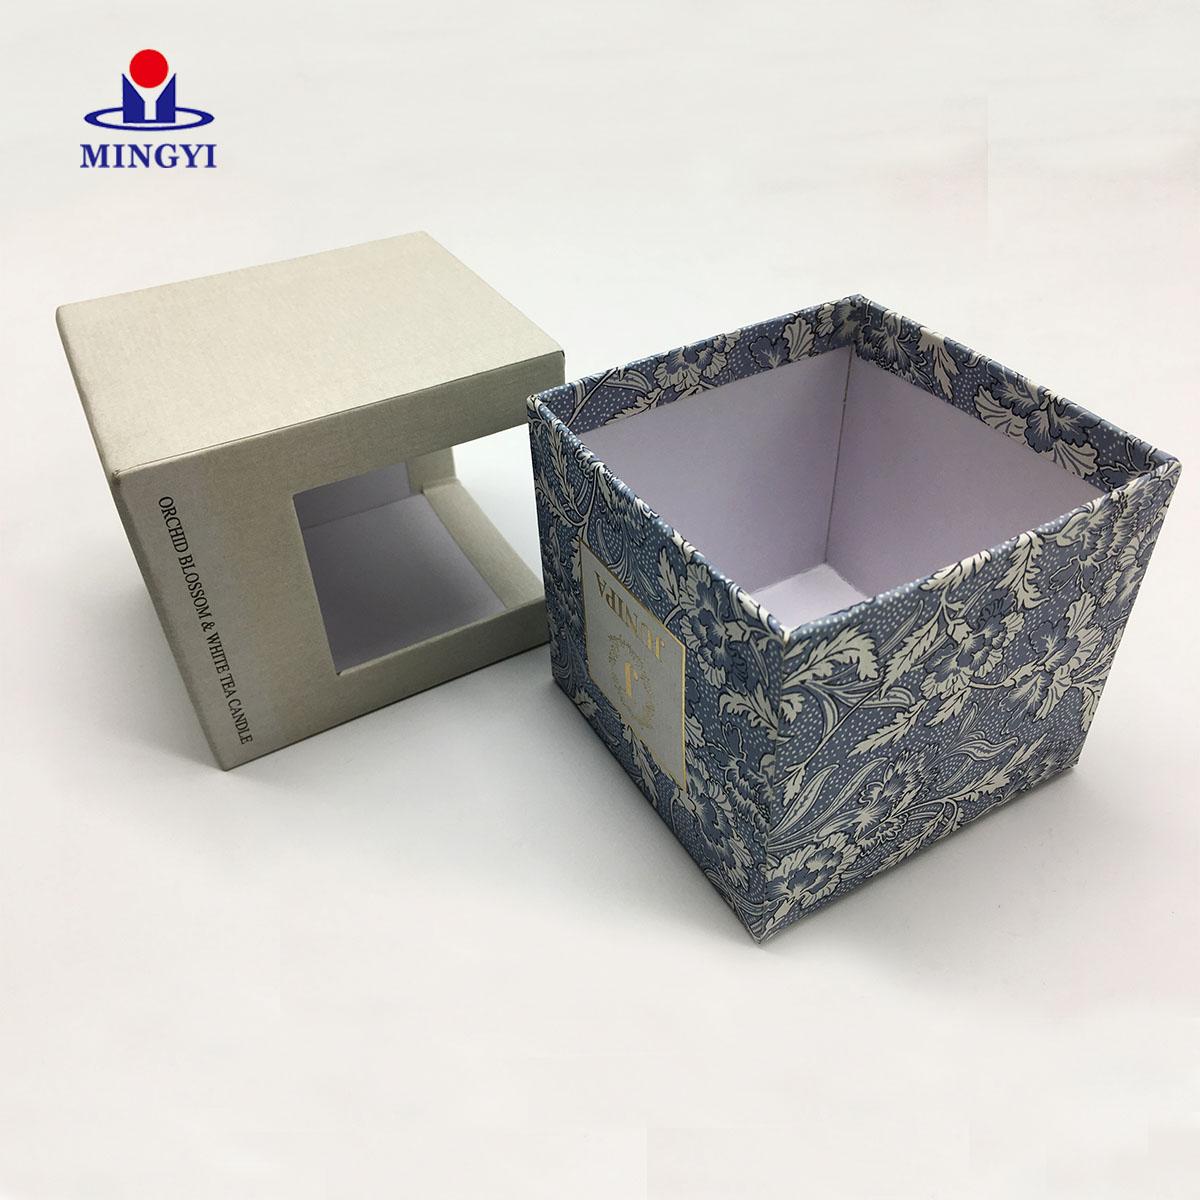 Mingyi Printing Array image128